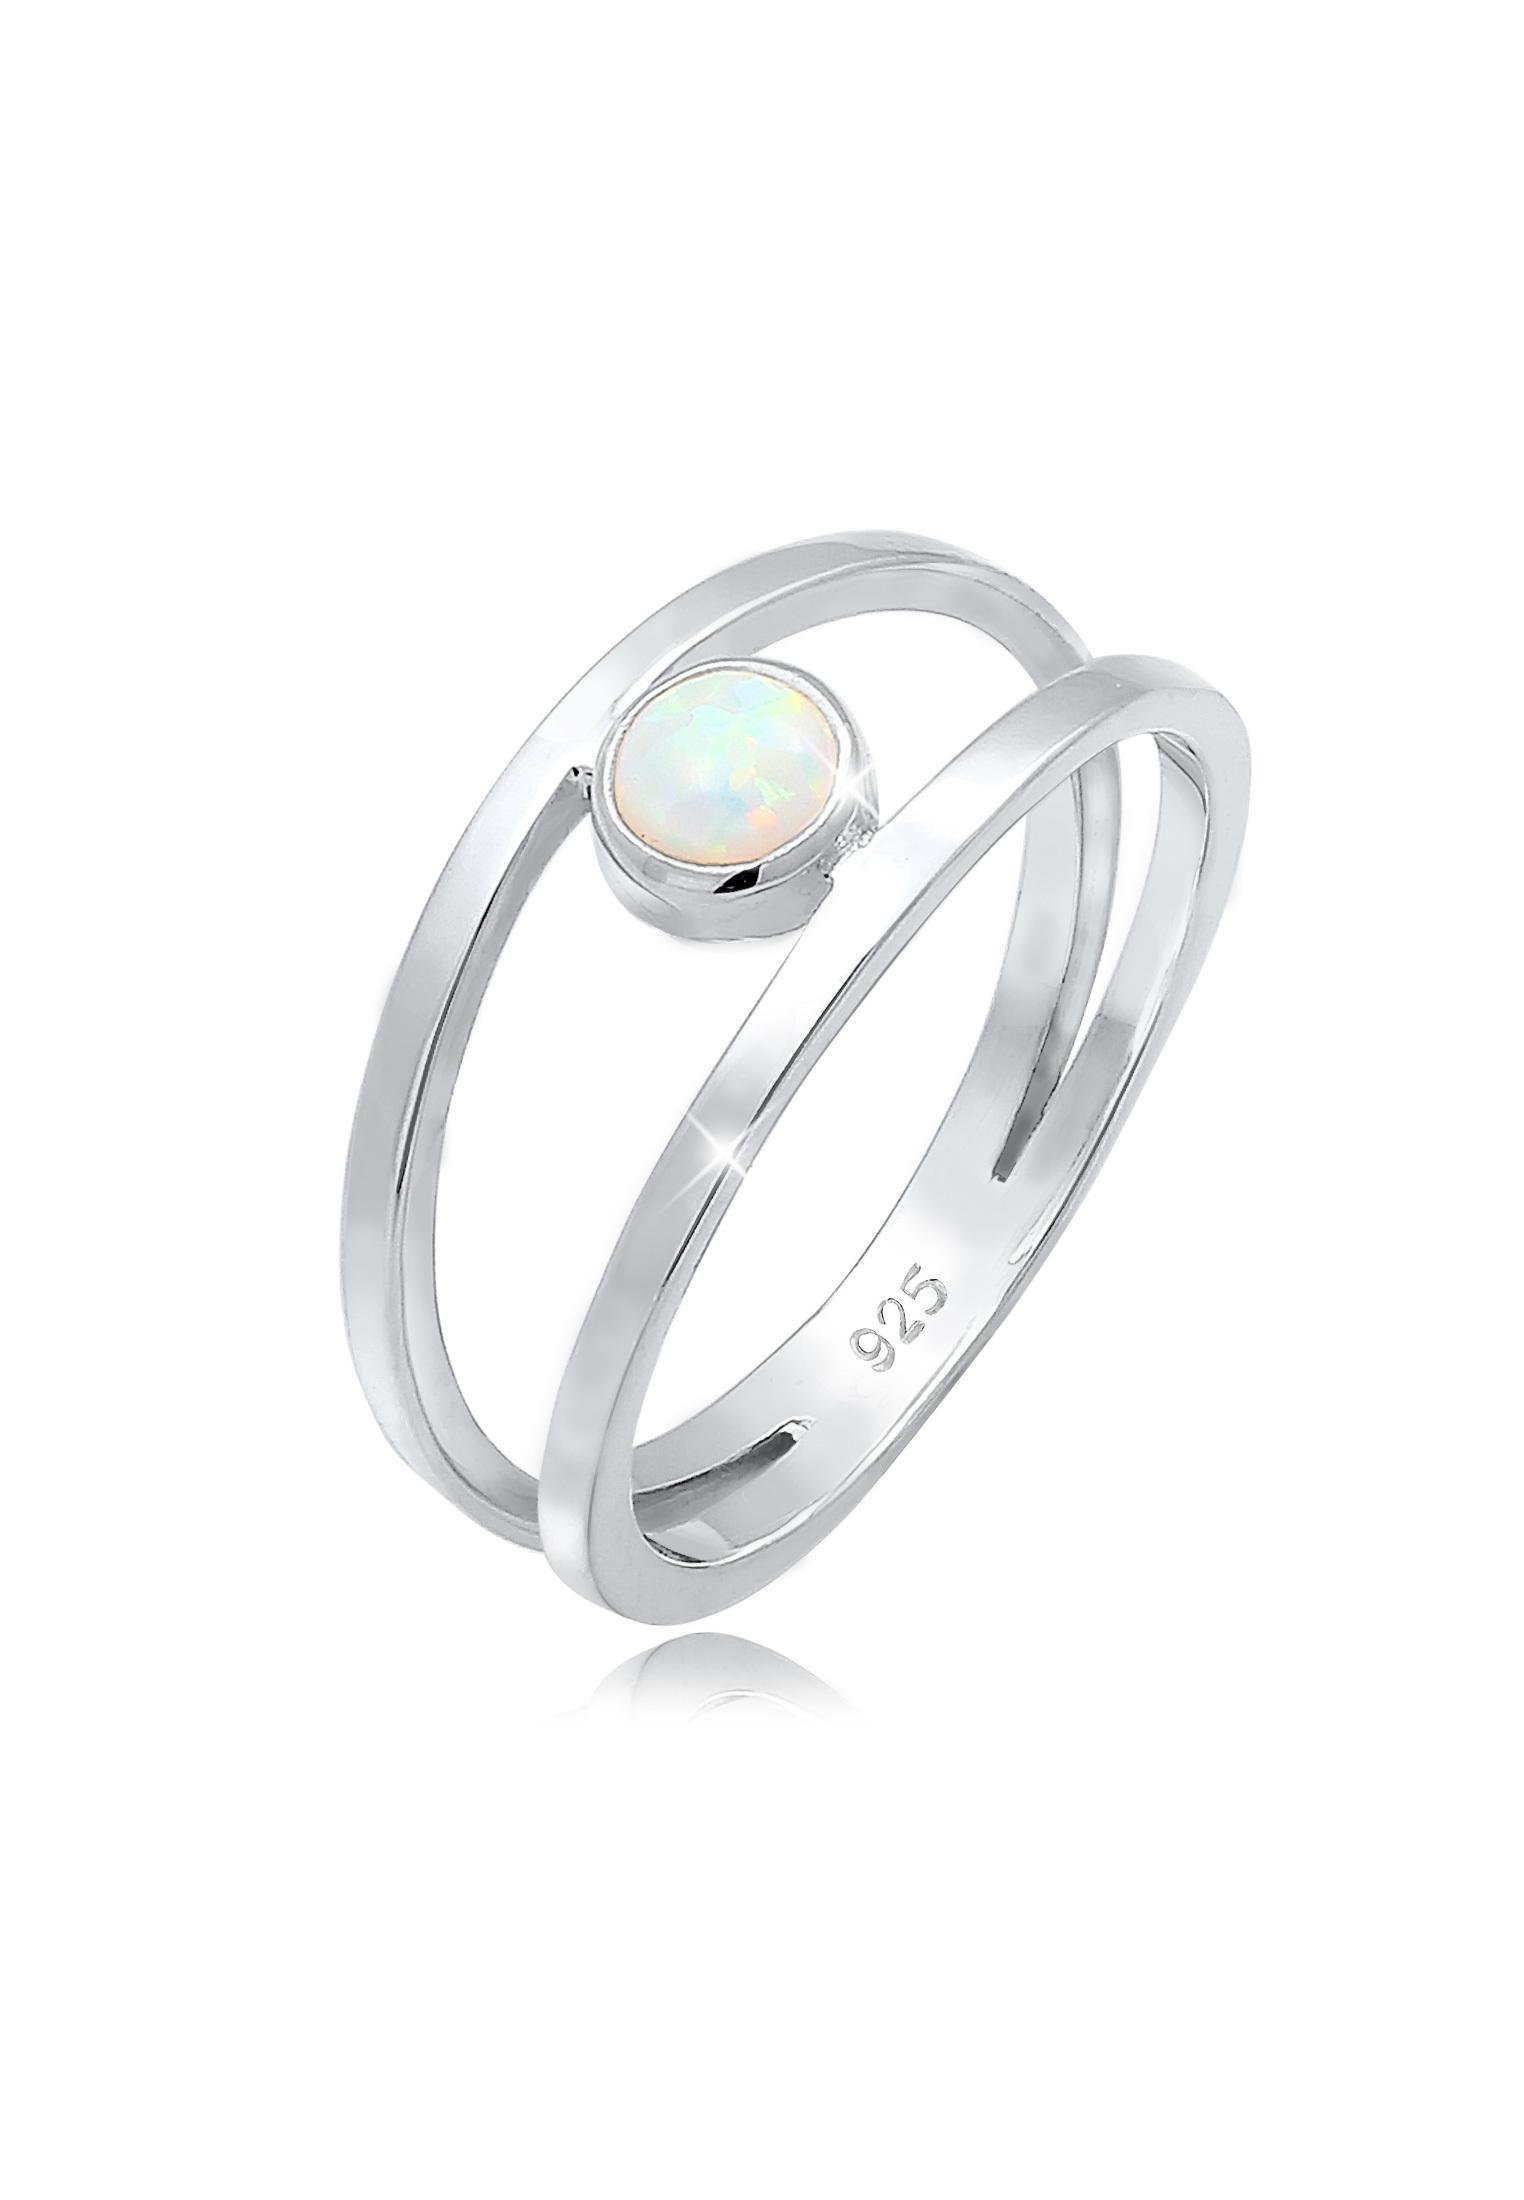 Ring   Opal ( Weiß )   925er Sterling Silber